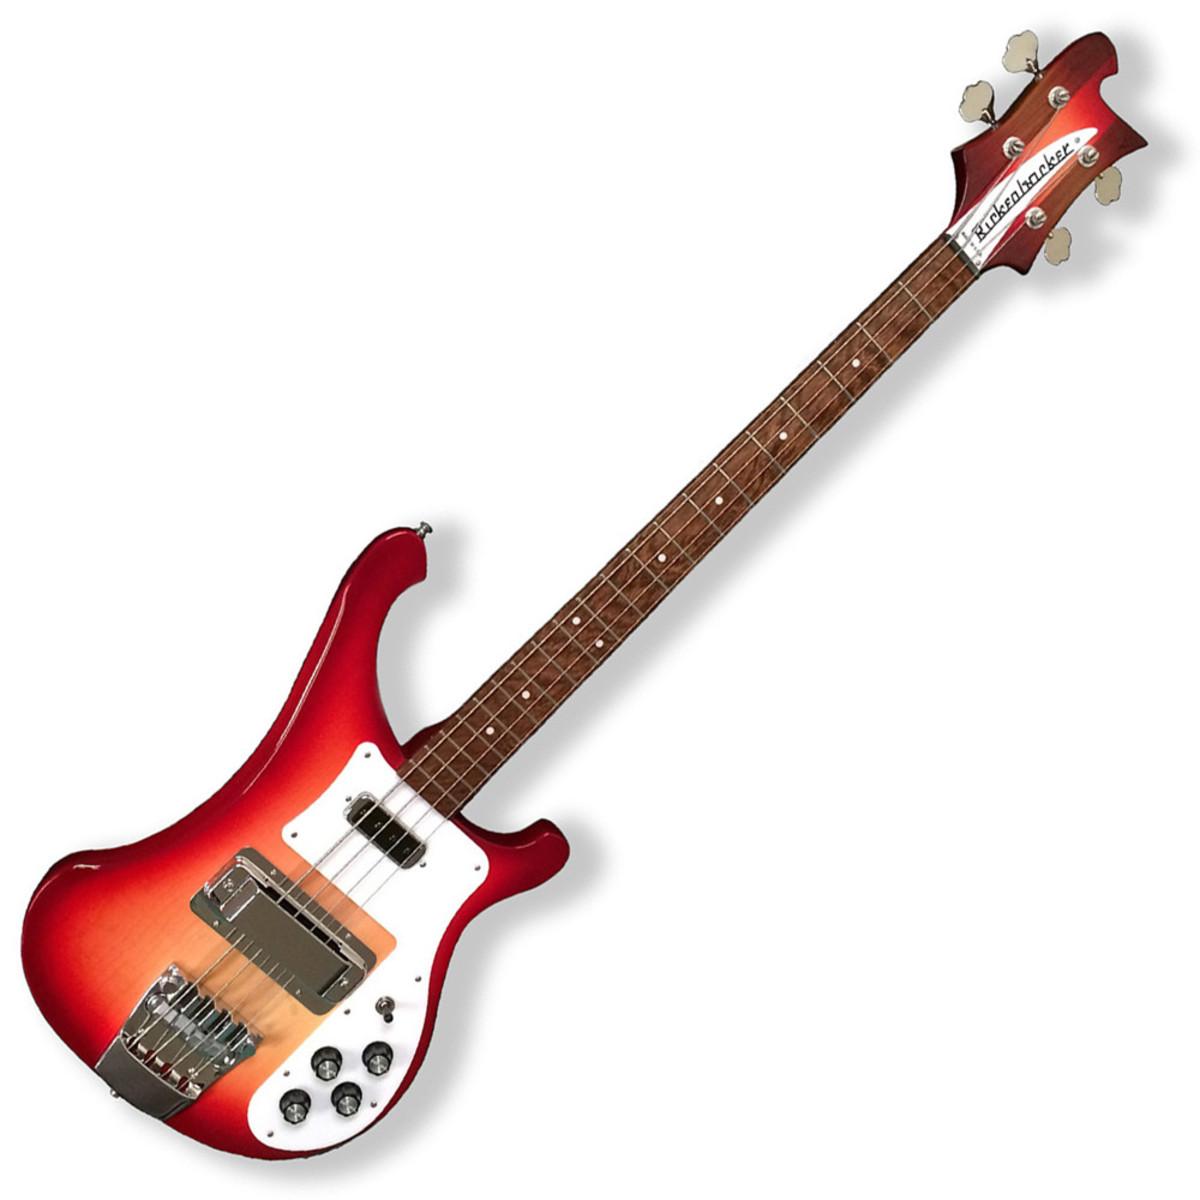 rickenbacker 4003s bass guitar fireglo at. Black Bedroom Furniture Sets. Home Design Ideas